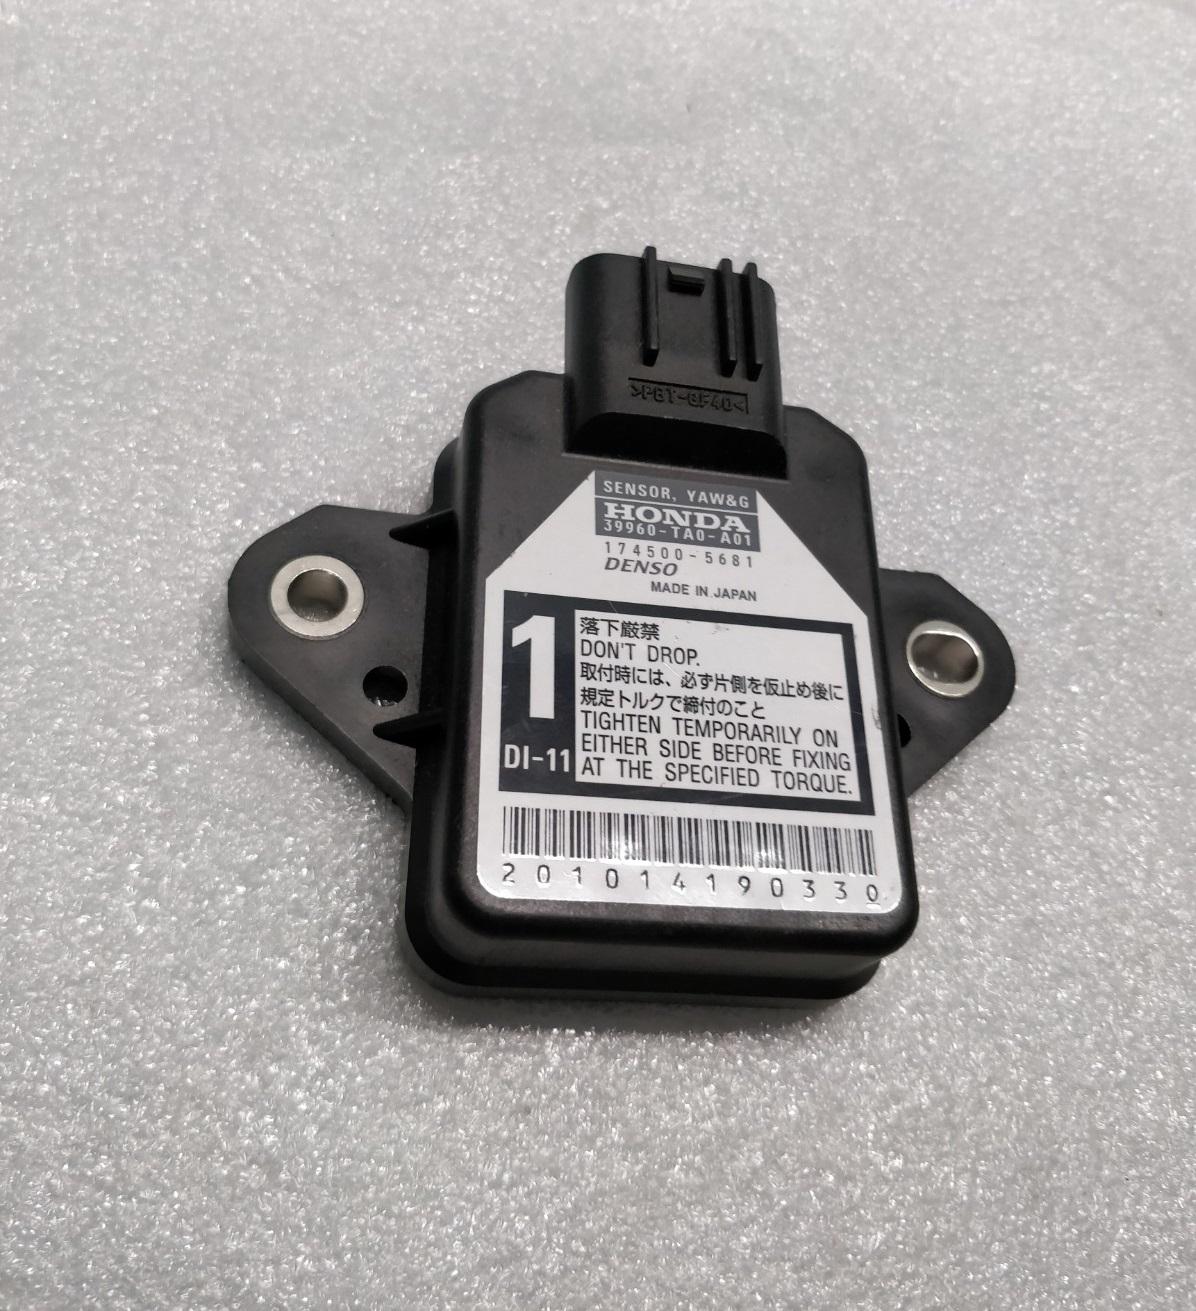 2010 HONDA JAZZ Yaw Rate Sensor 1.3 1.4 174500-5681 ACCORD